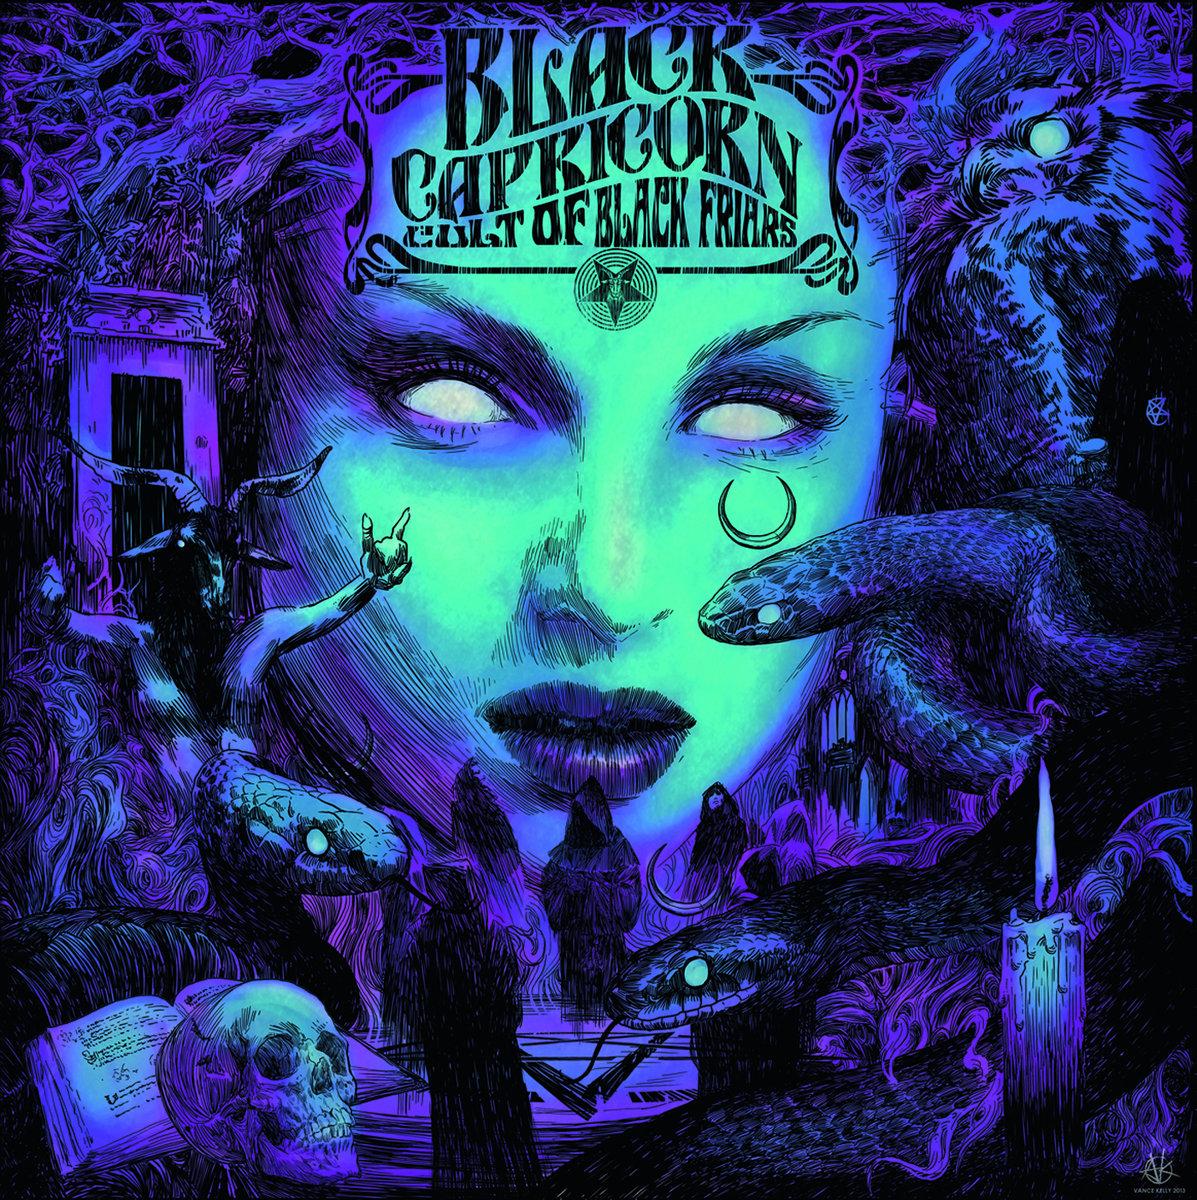 Cult of Black Friars | Black Capricorn